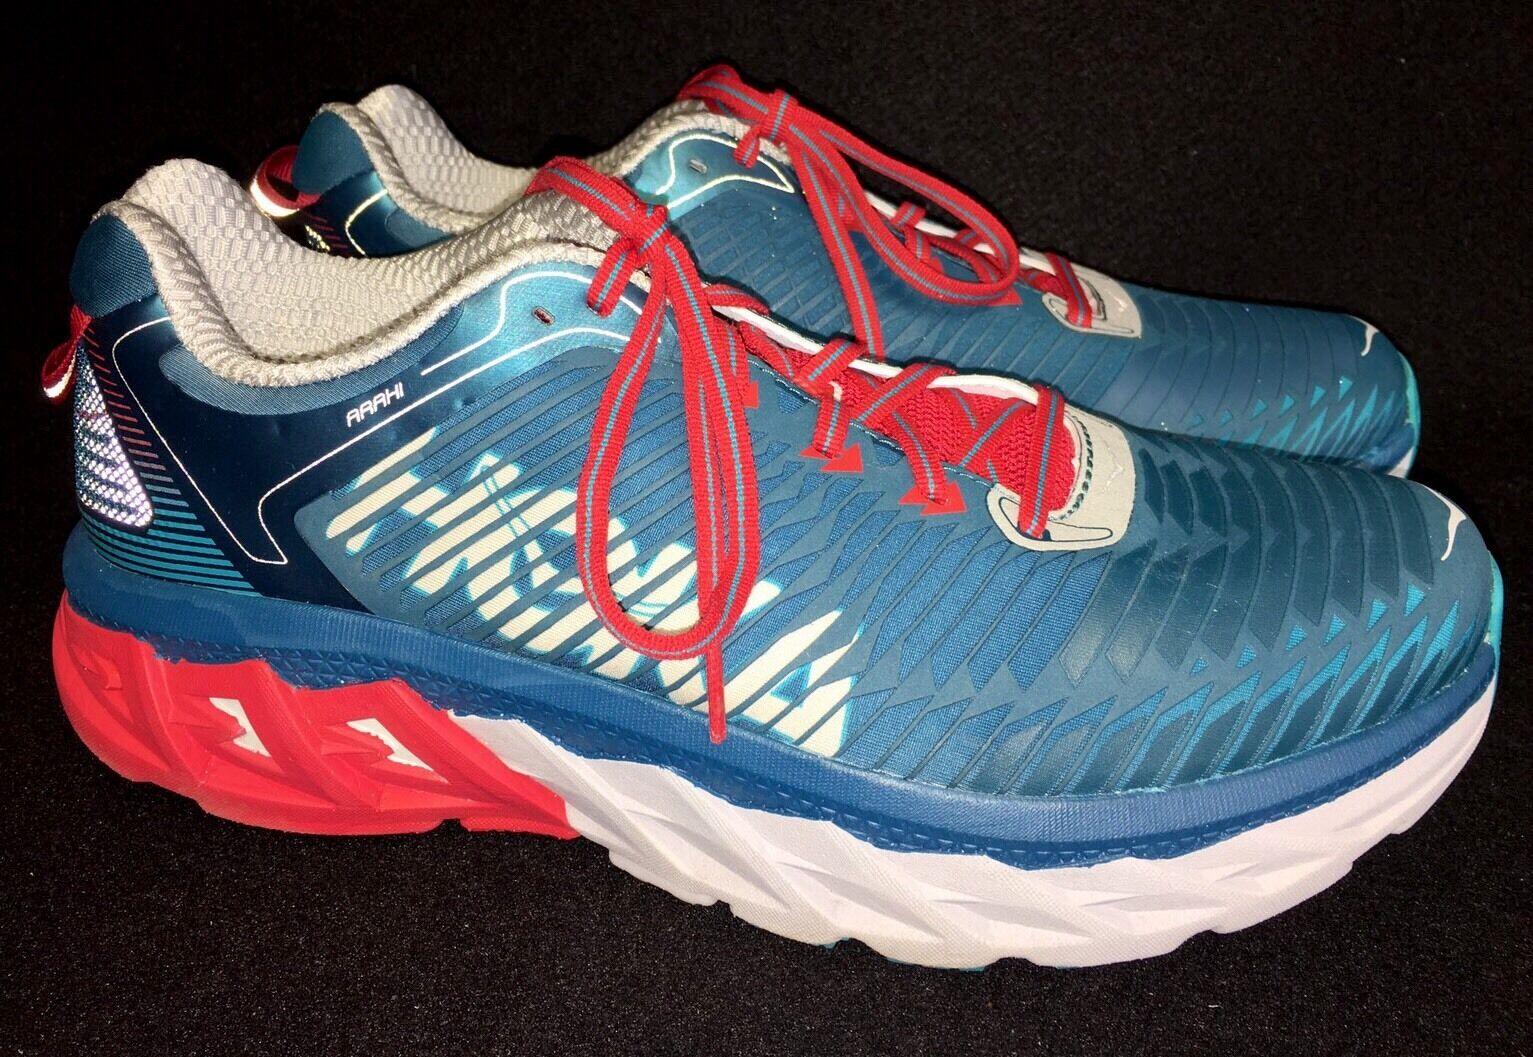 wholesale dealer e26c6 29896 HOKA ONE ONE Arahi Men s running tennis tennis tennis shoes Blue Coral True  Red 1016258 size